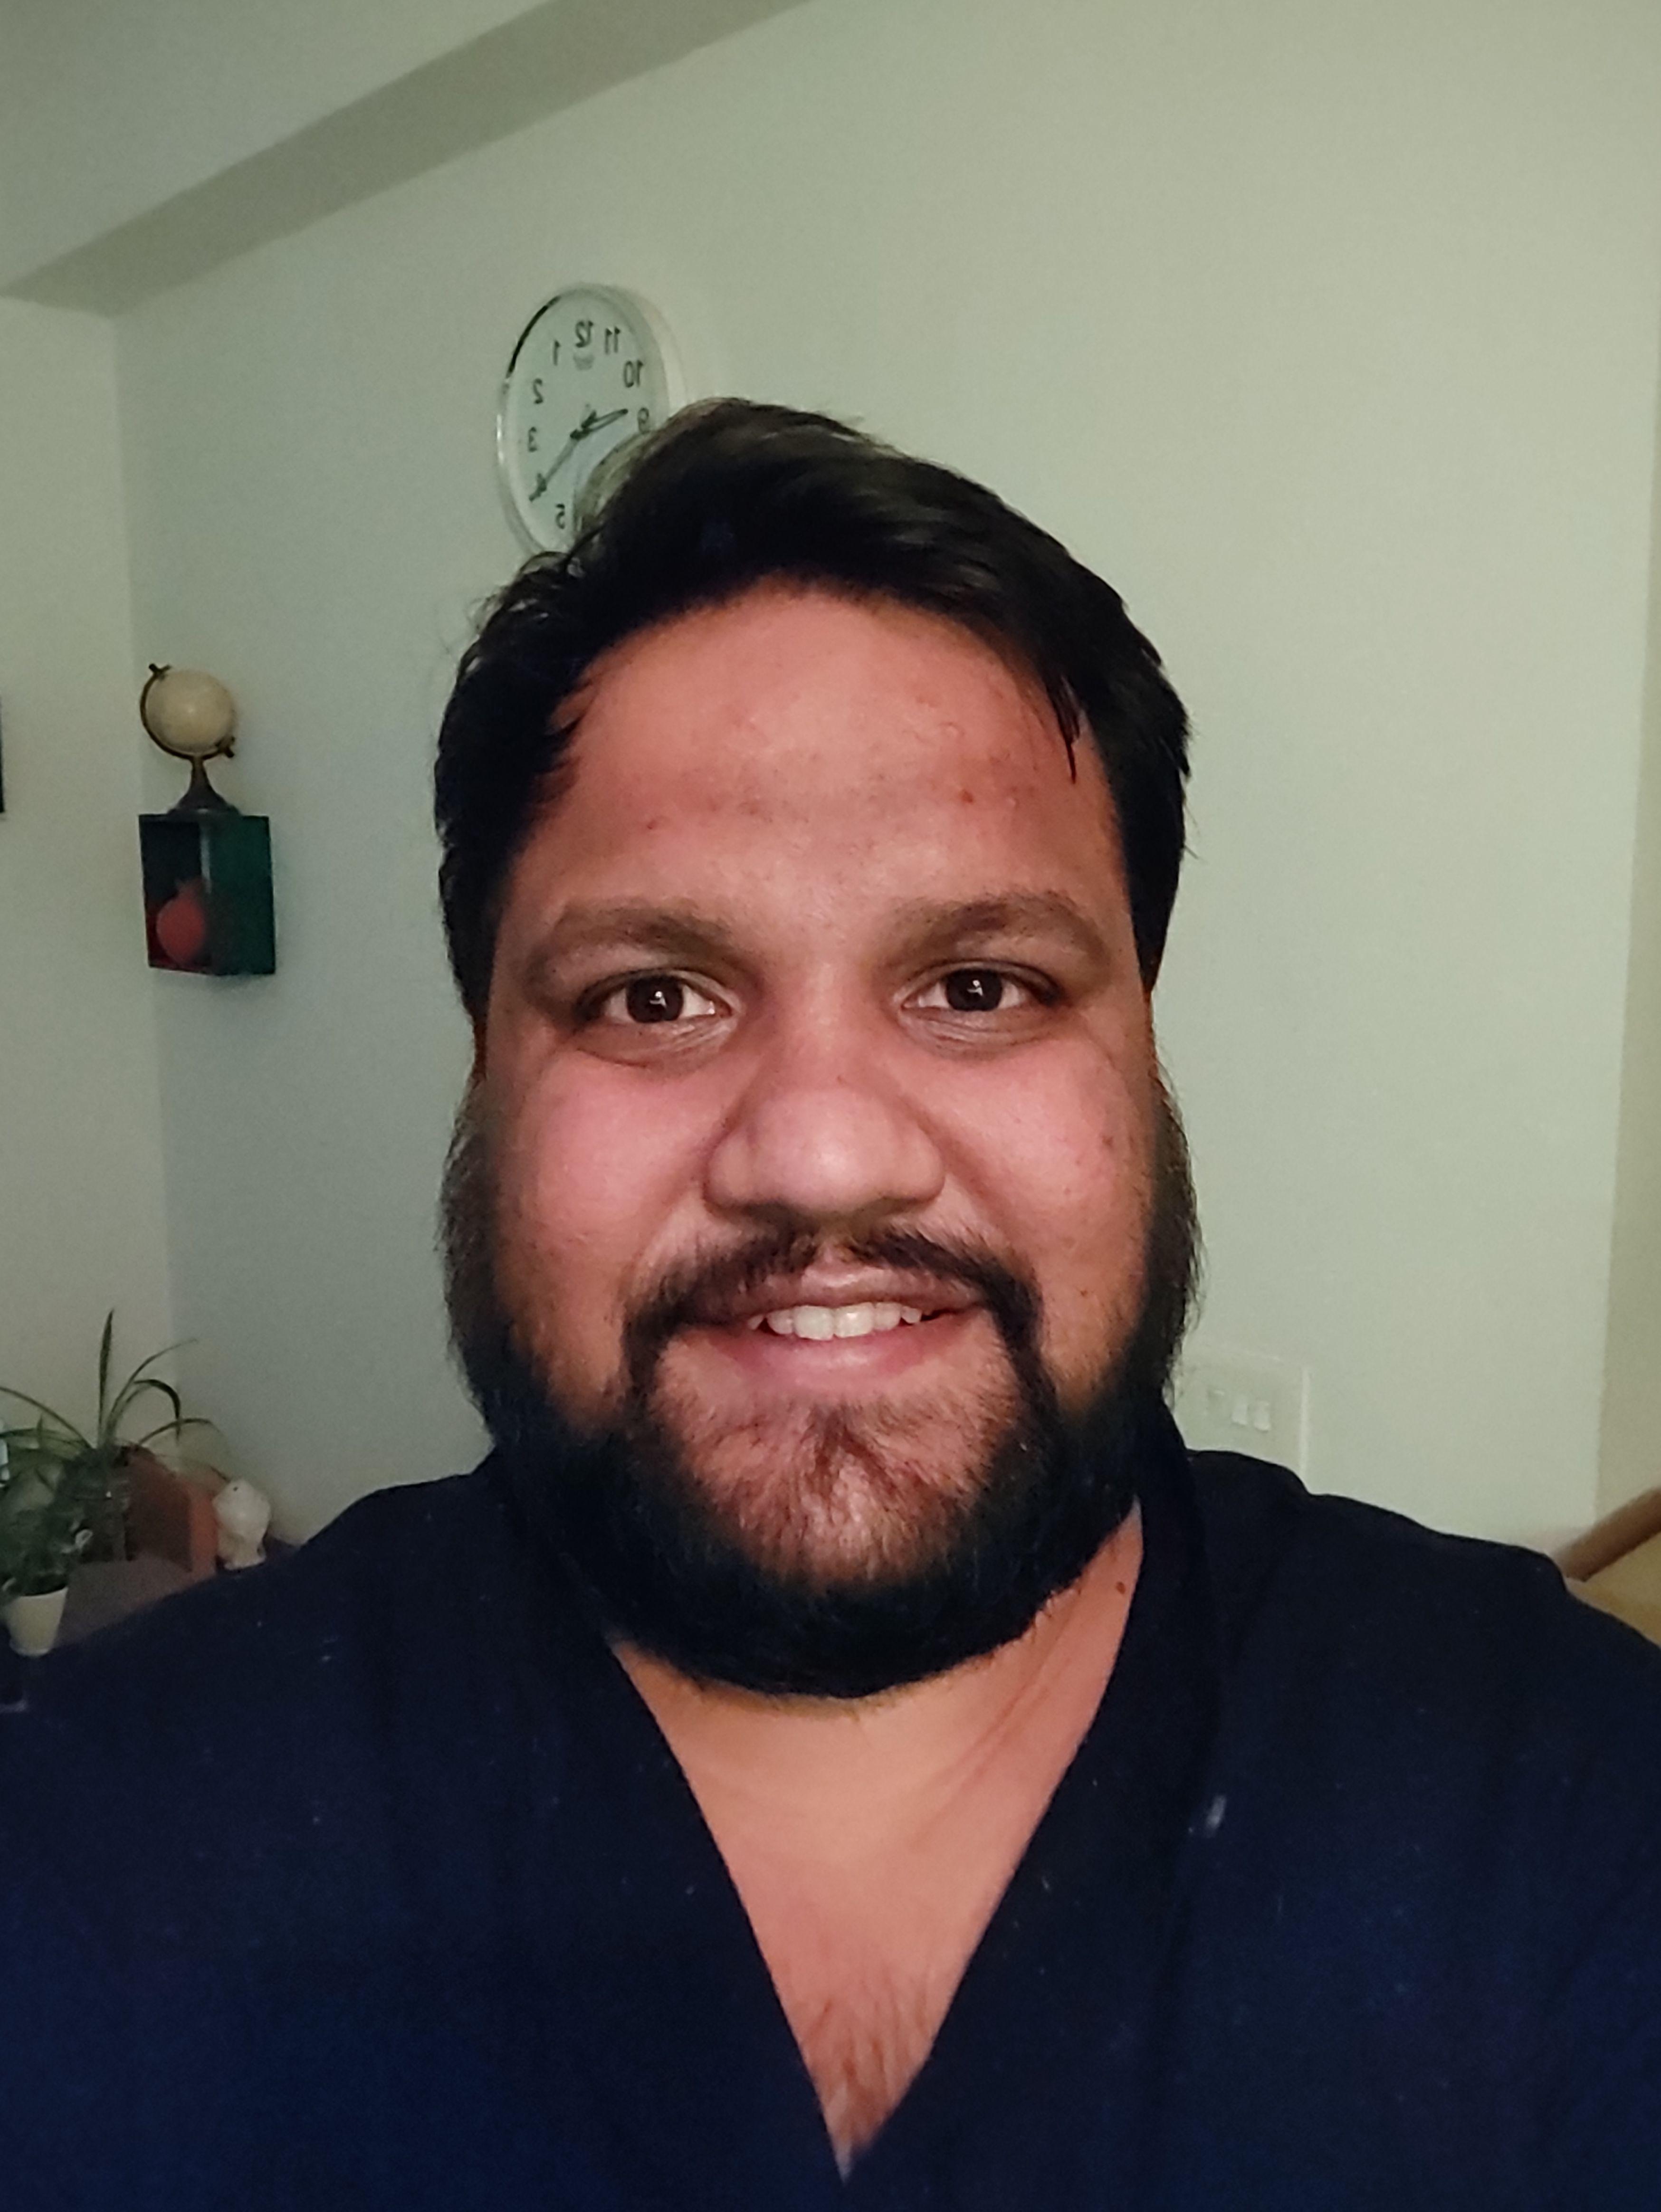 Mi 10i Camera Low Light Selfie